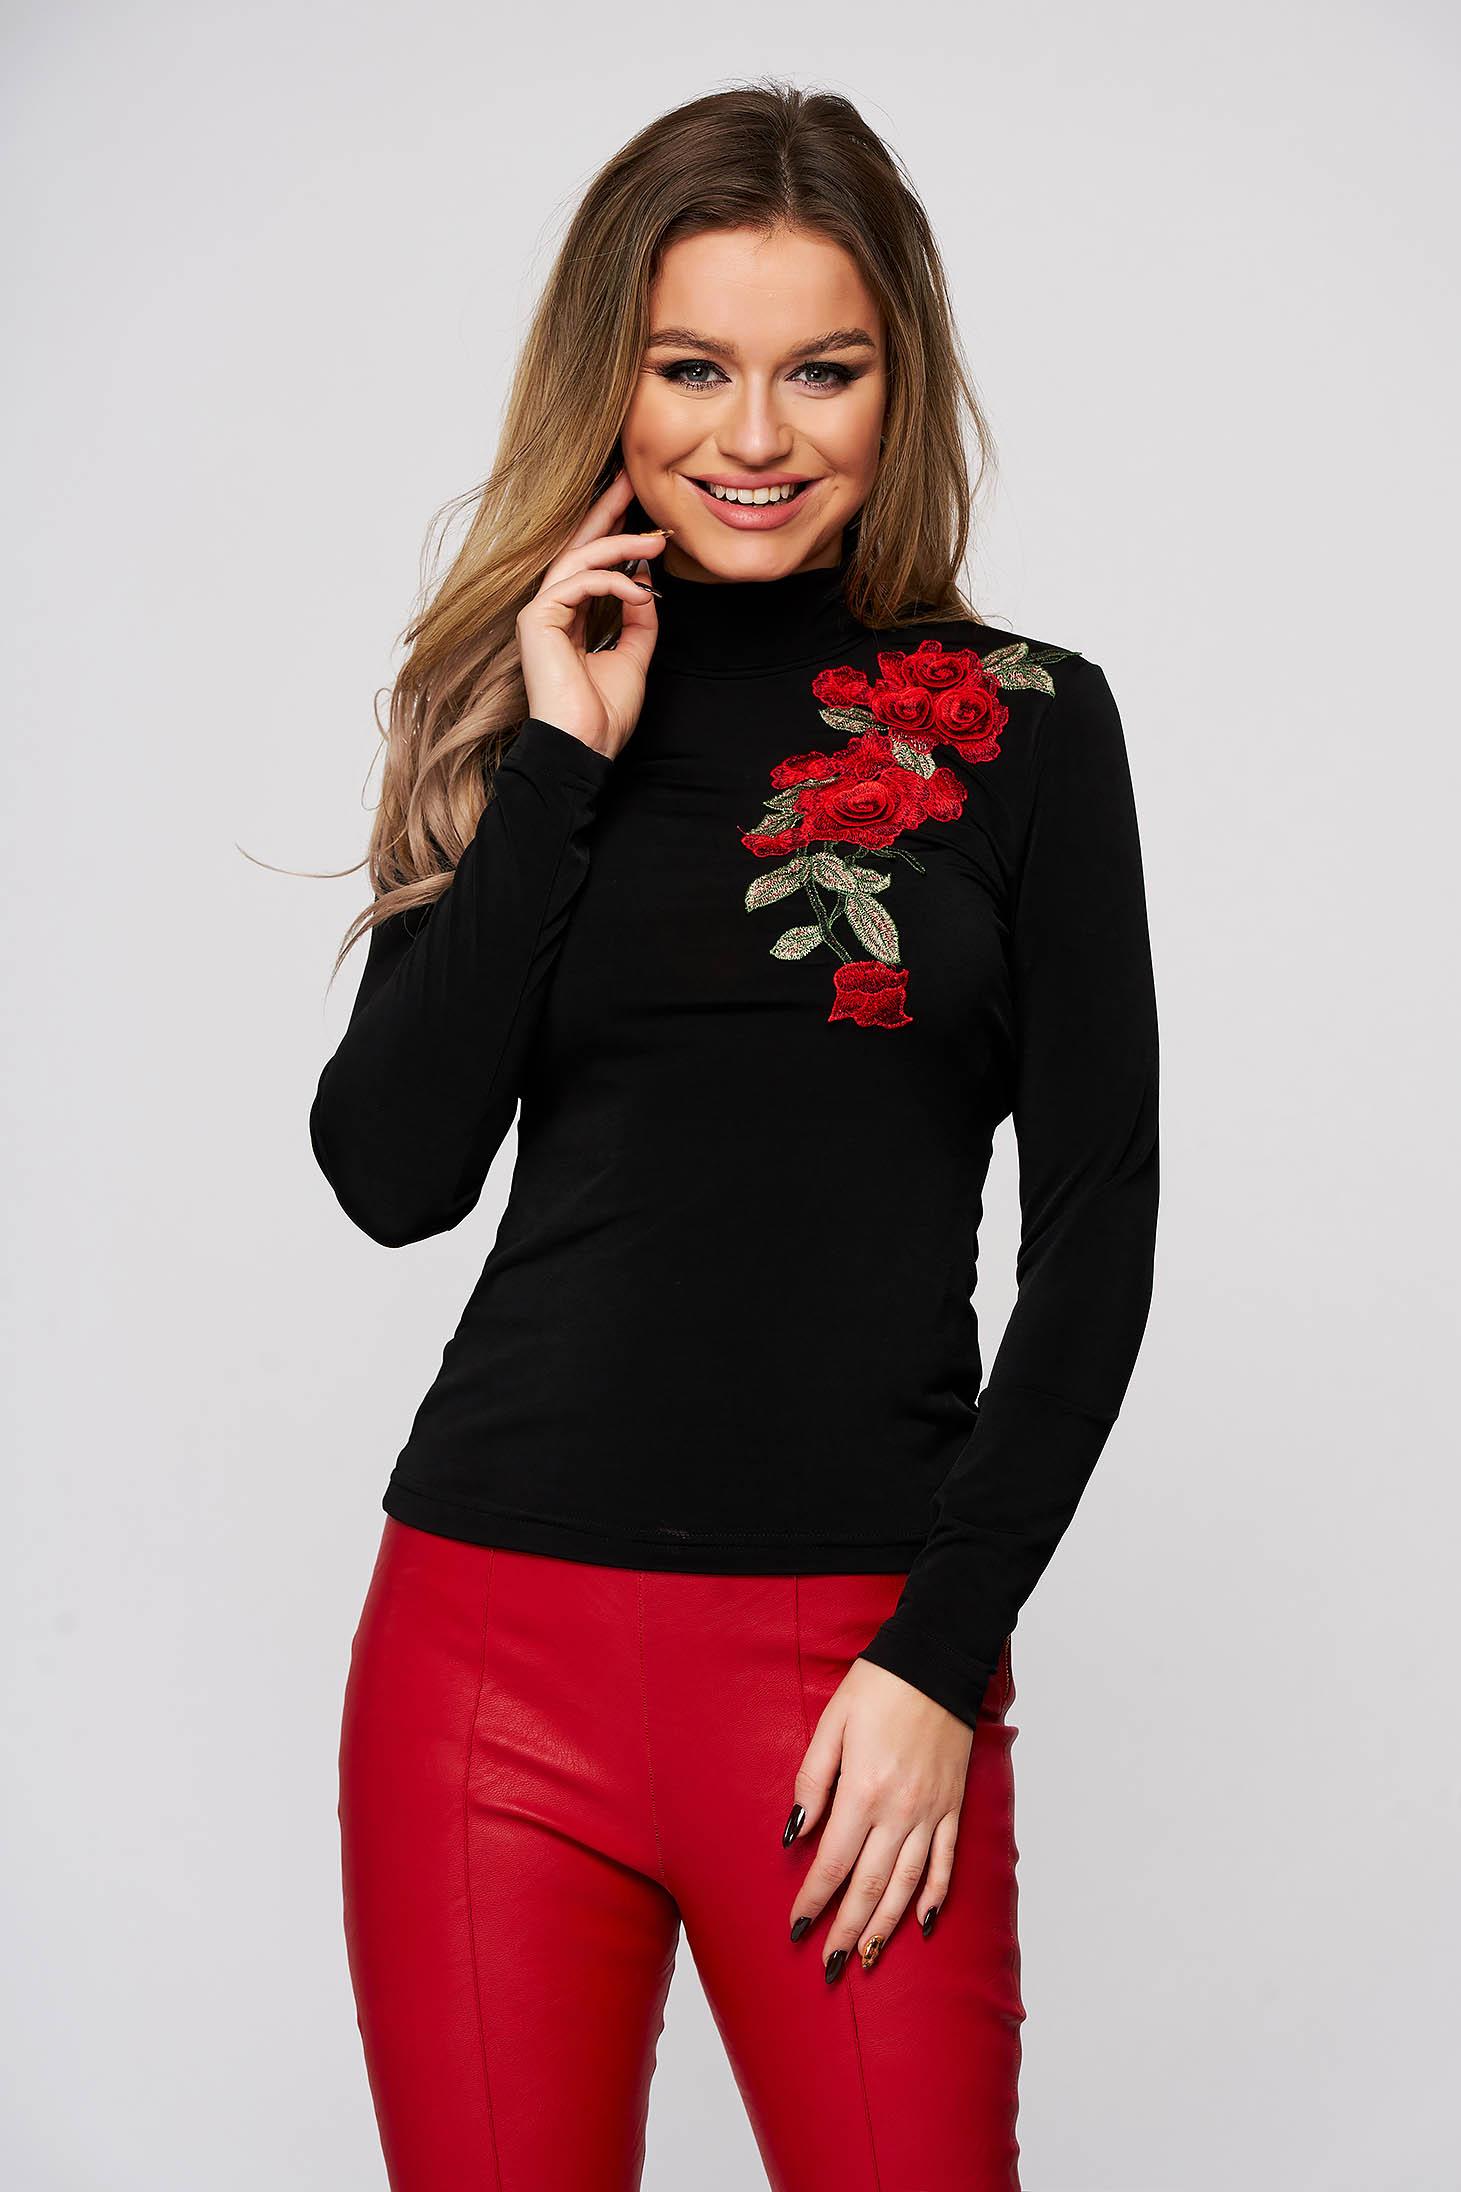 Bluza dama StarShinerS neagra din material elastic si fin cu broderie florala manuala mulata pe gat